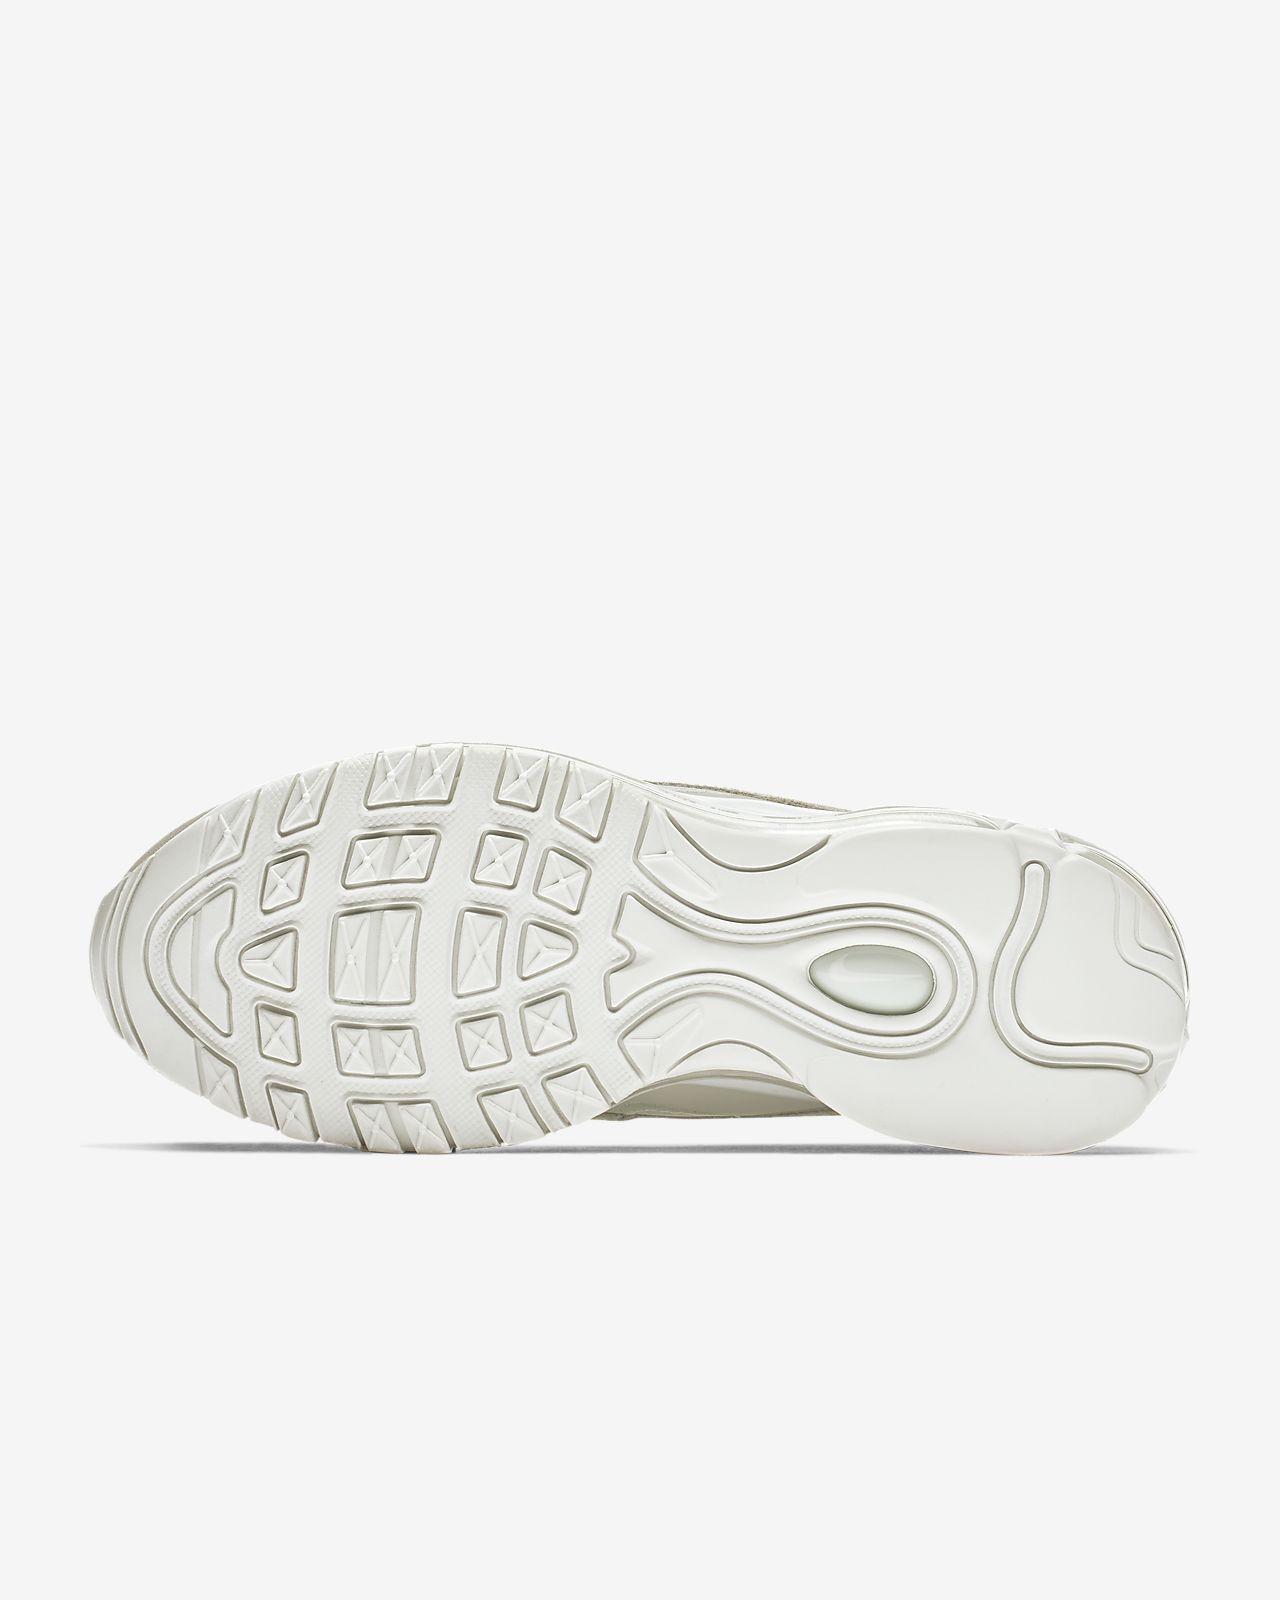 71c168eb52ed Nike Air Max 97 Premium Women s Shoe. Nike.com GB